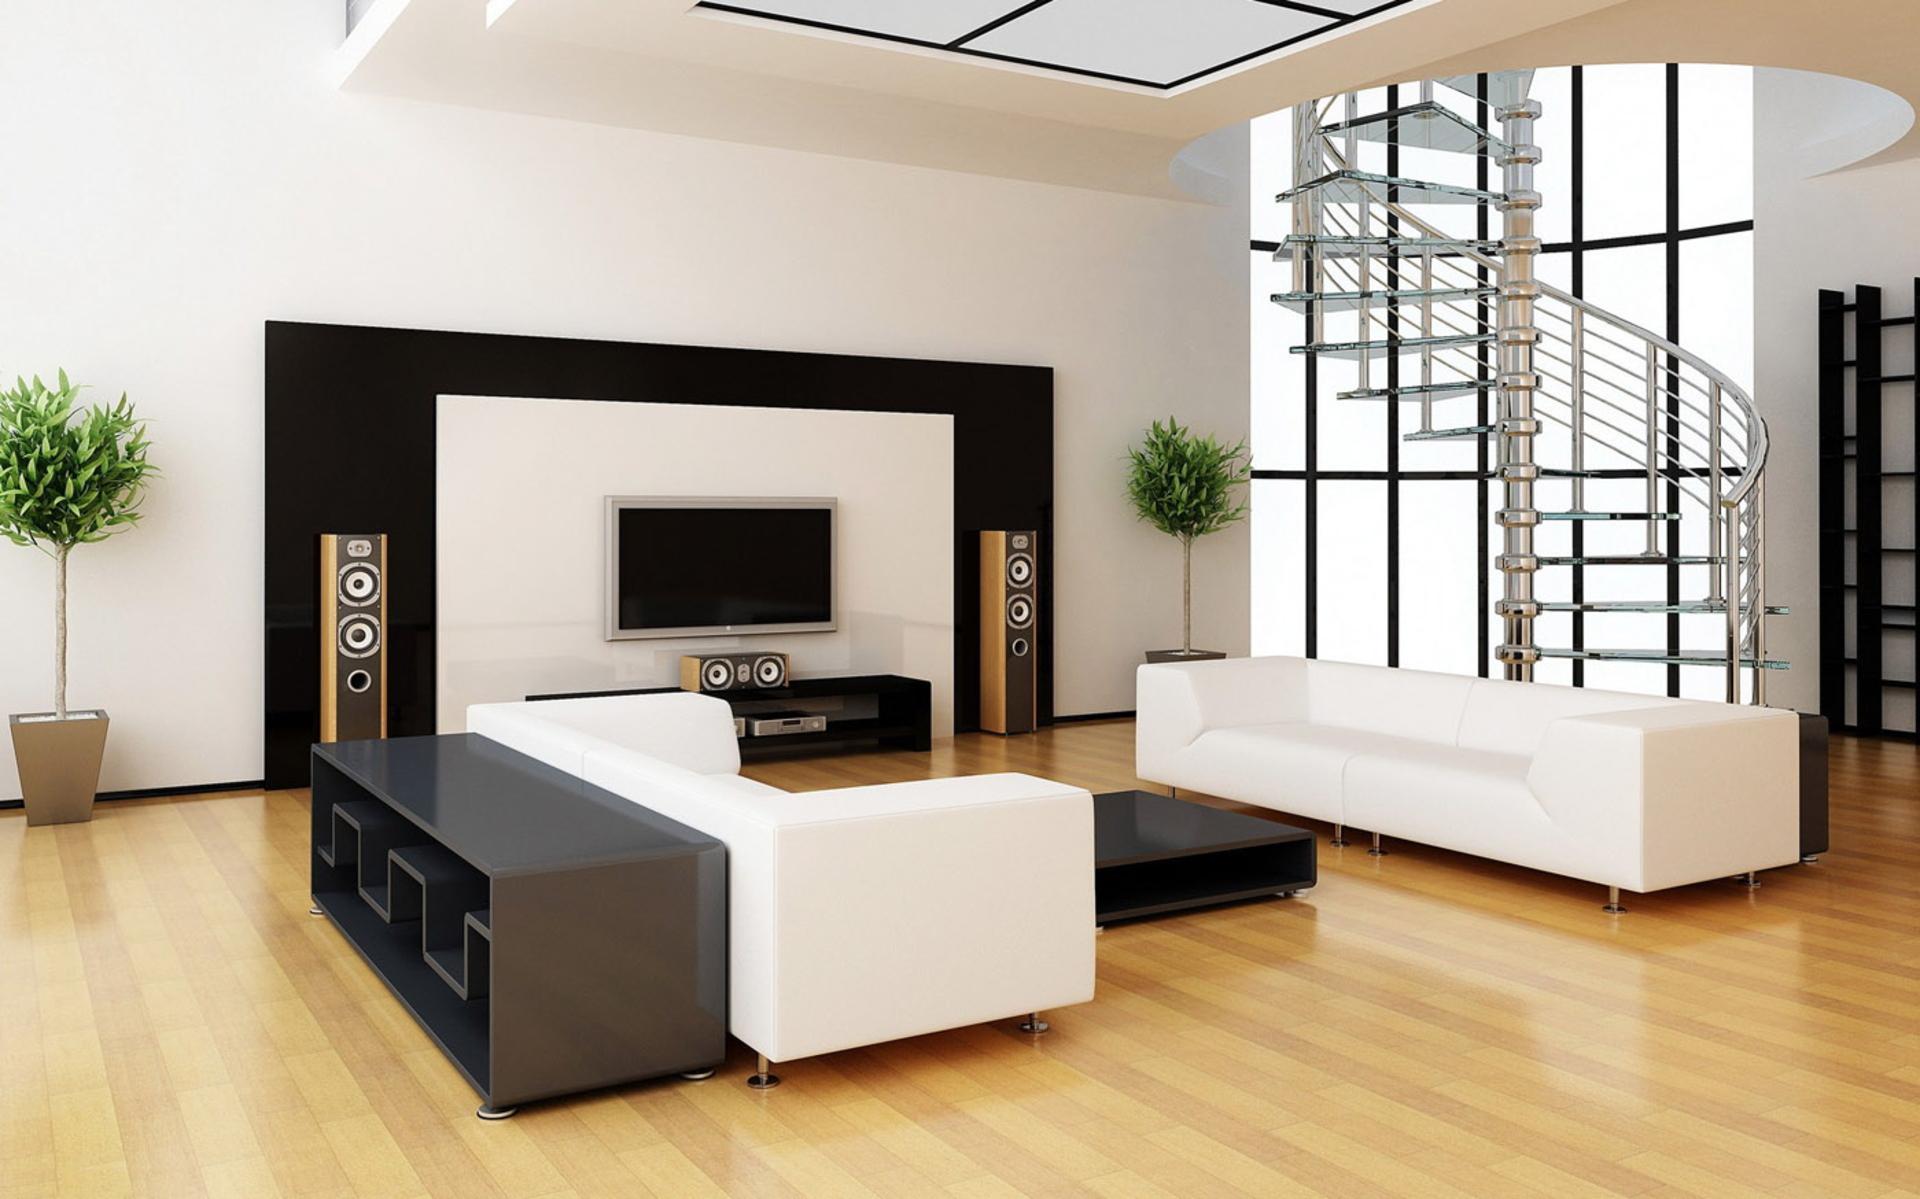 Foto Ruang Tv Minimalis